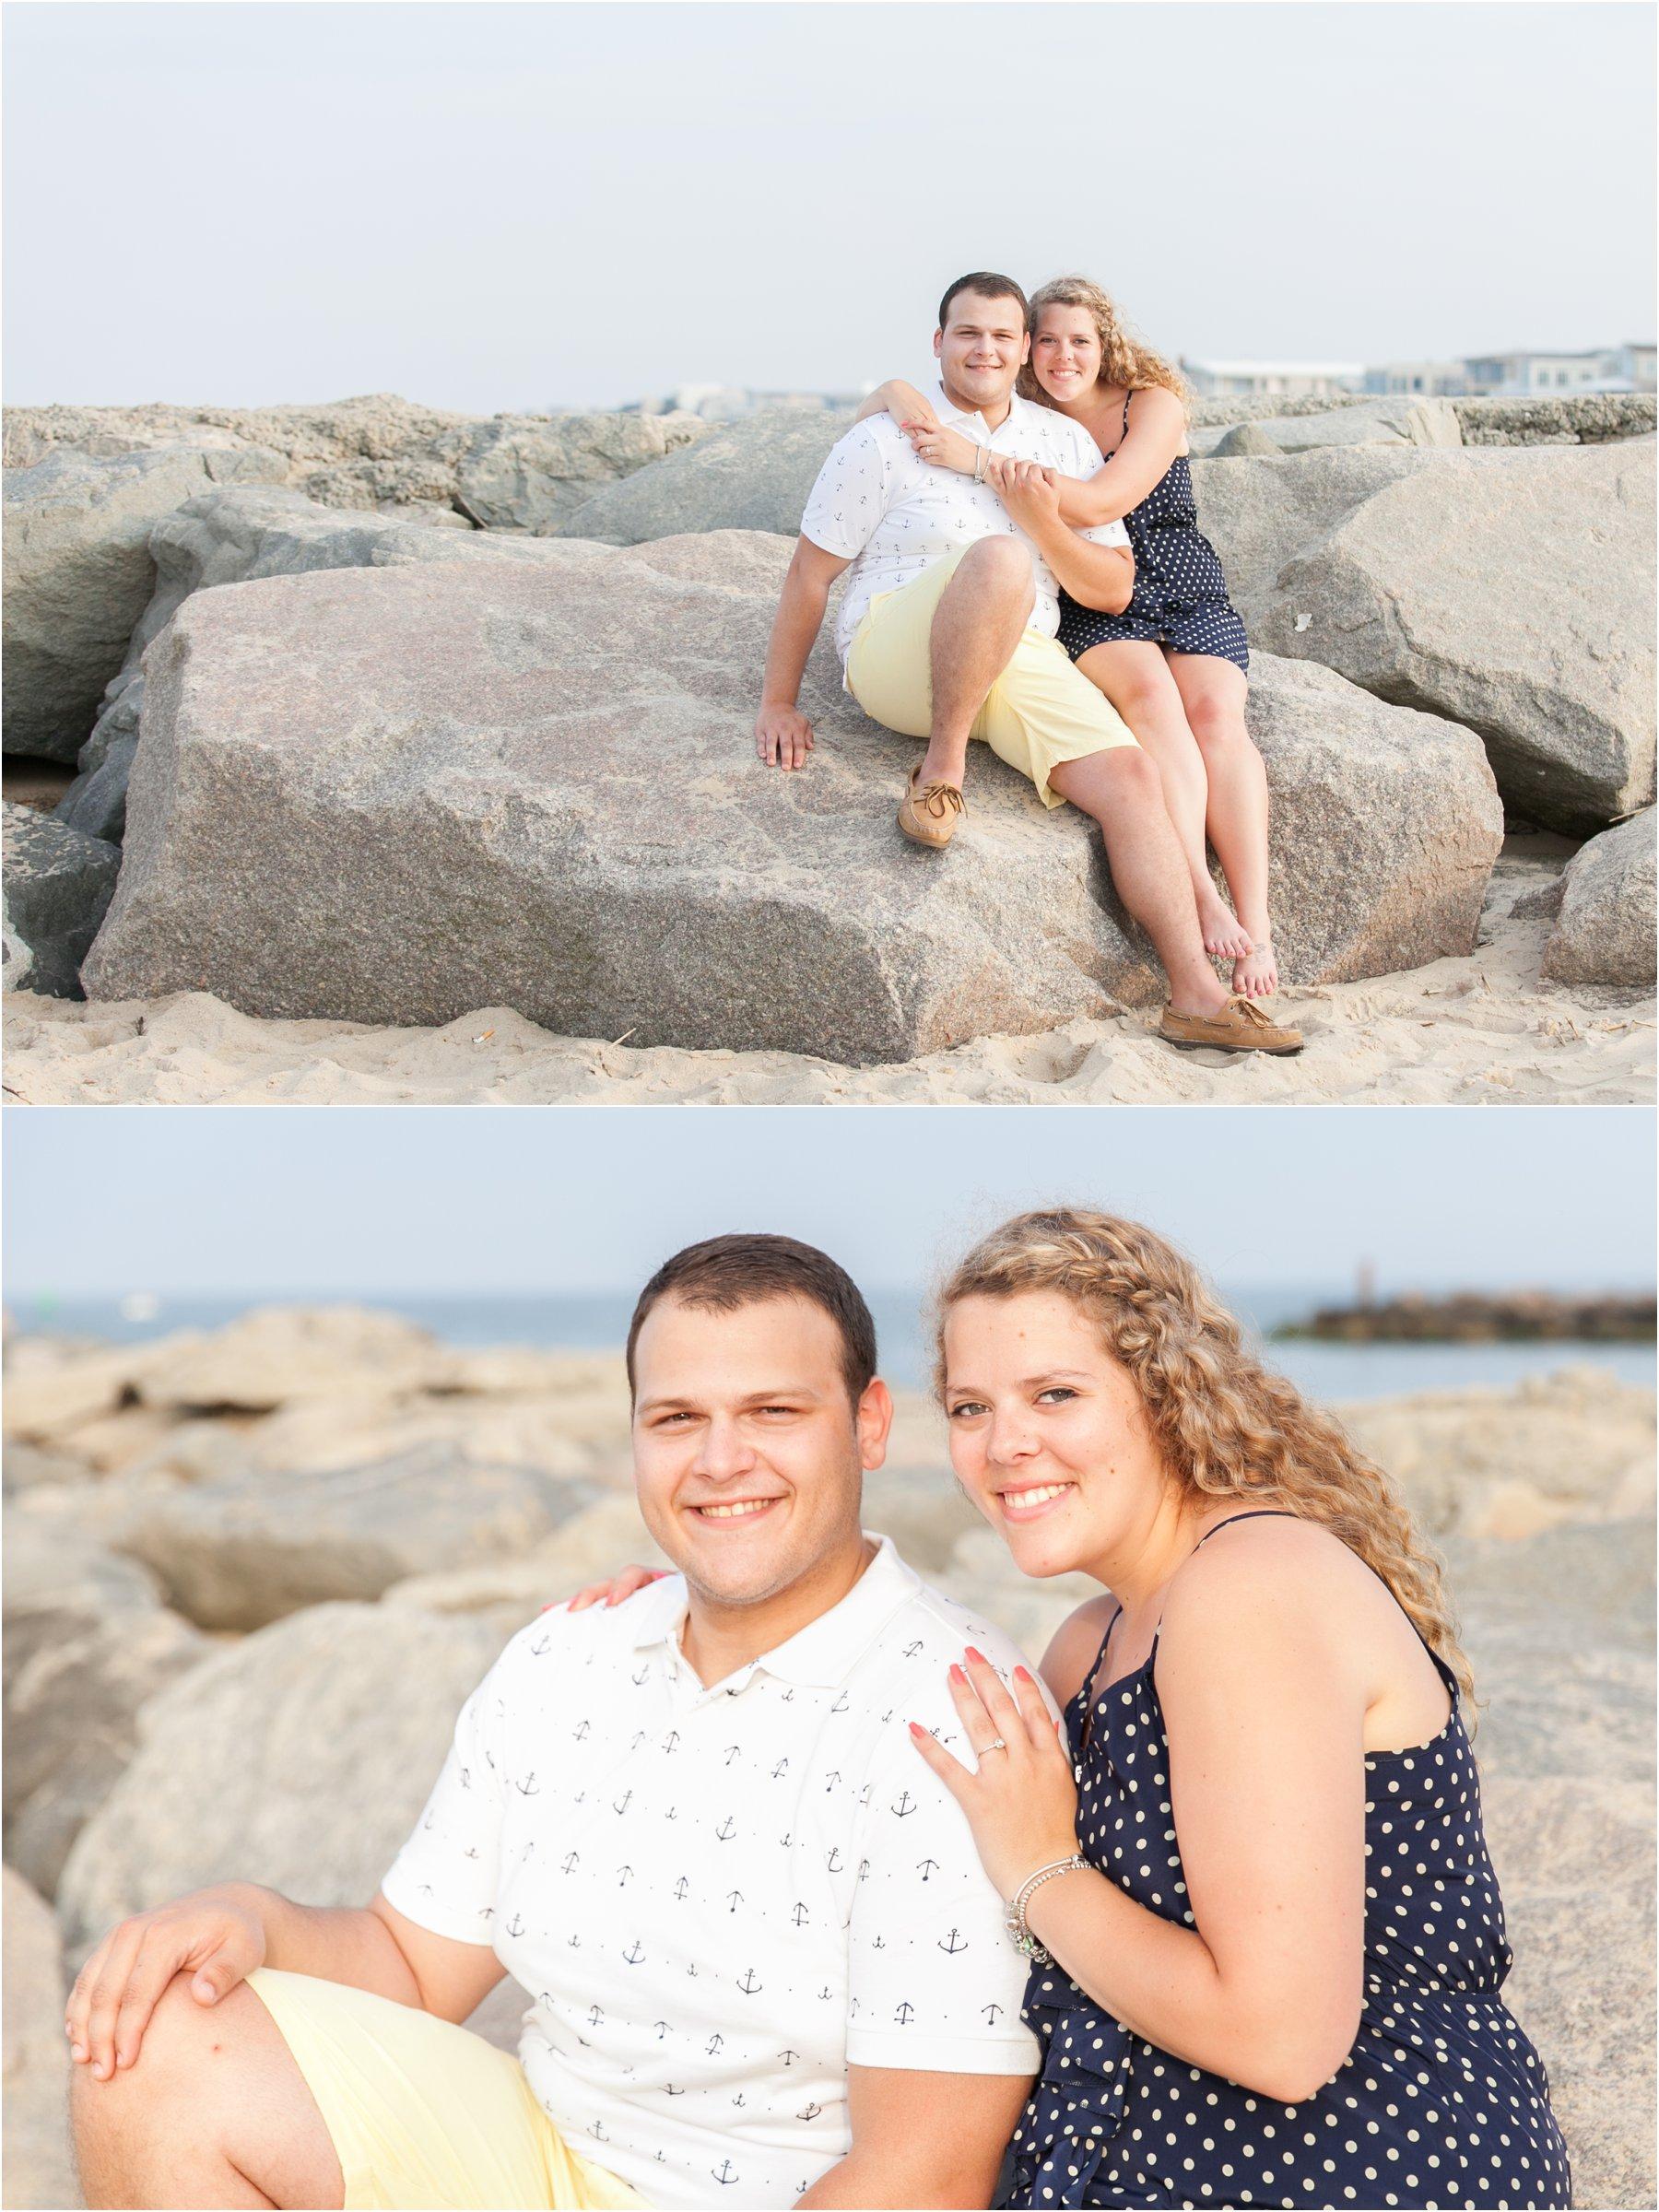 engagement_beach_Photography_Jessica_Ryan_Photography_virginia_virginia_beach_0306